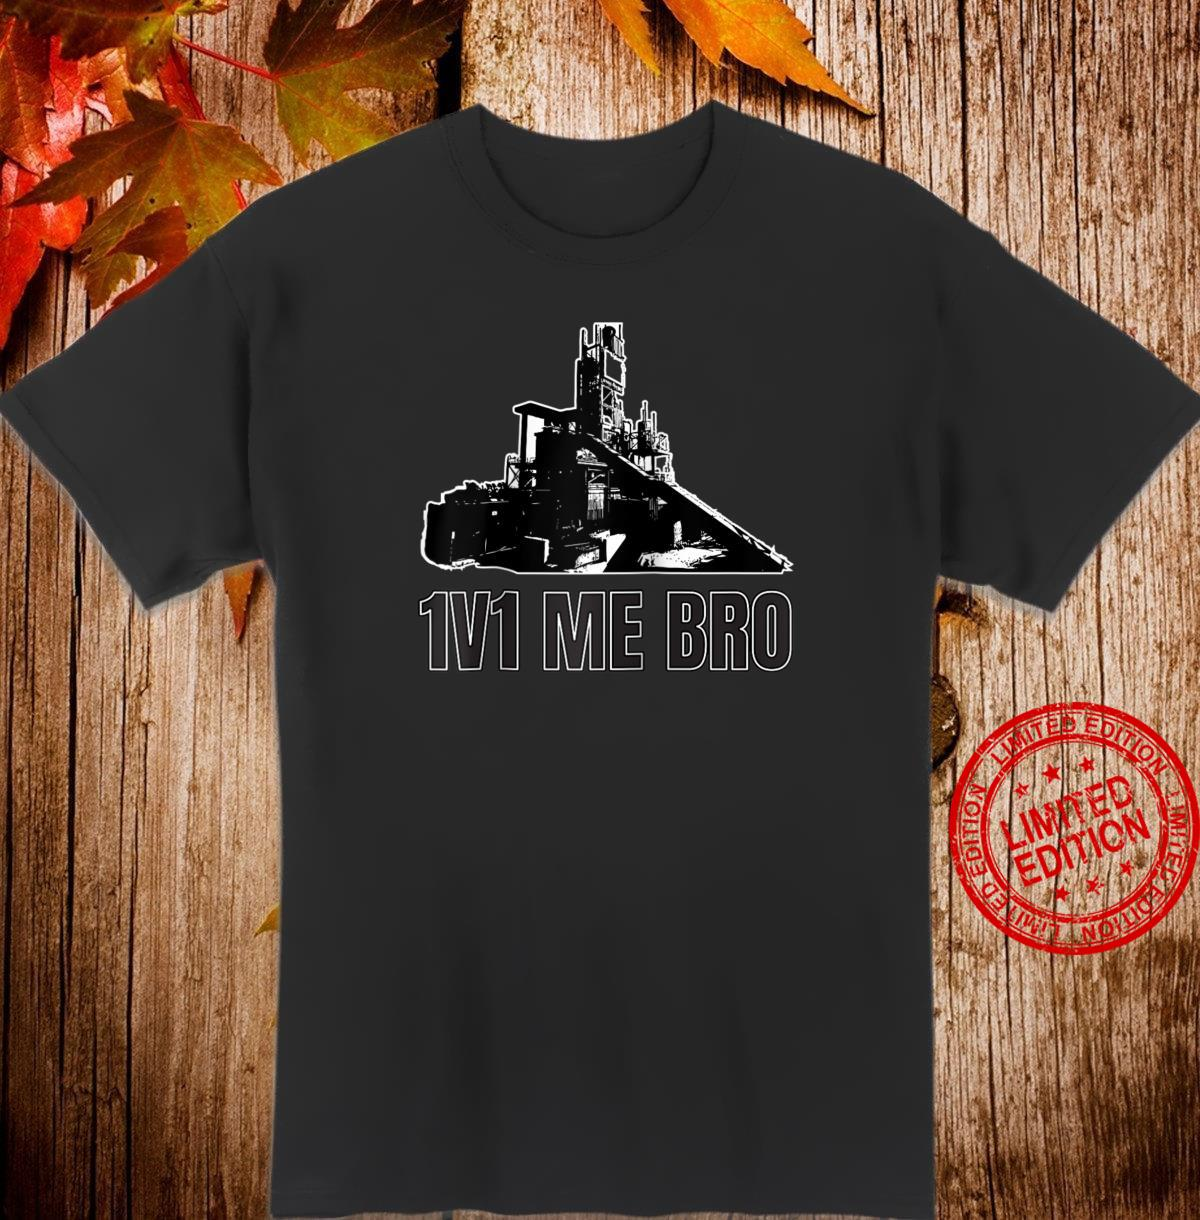 1V1 Me Bro COD Rust Shirt